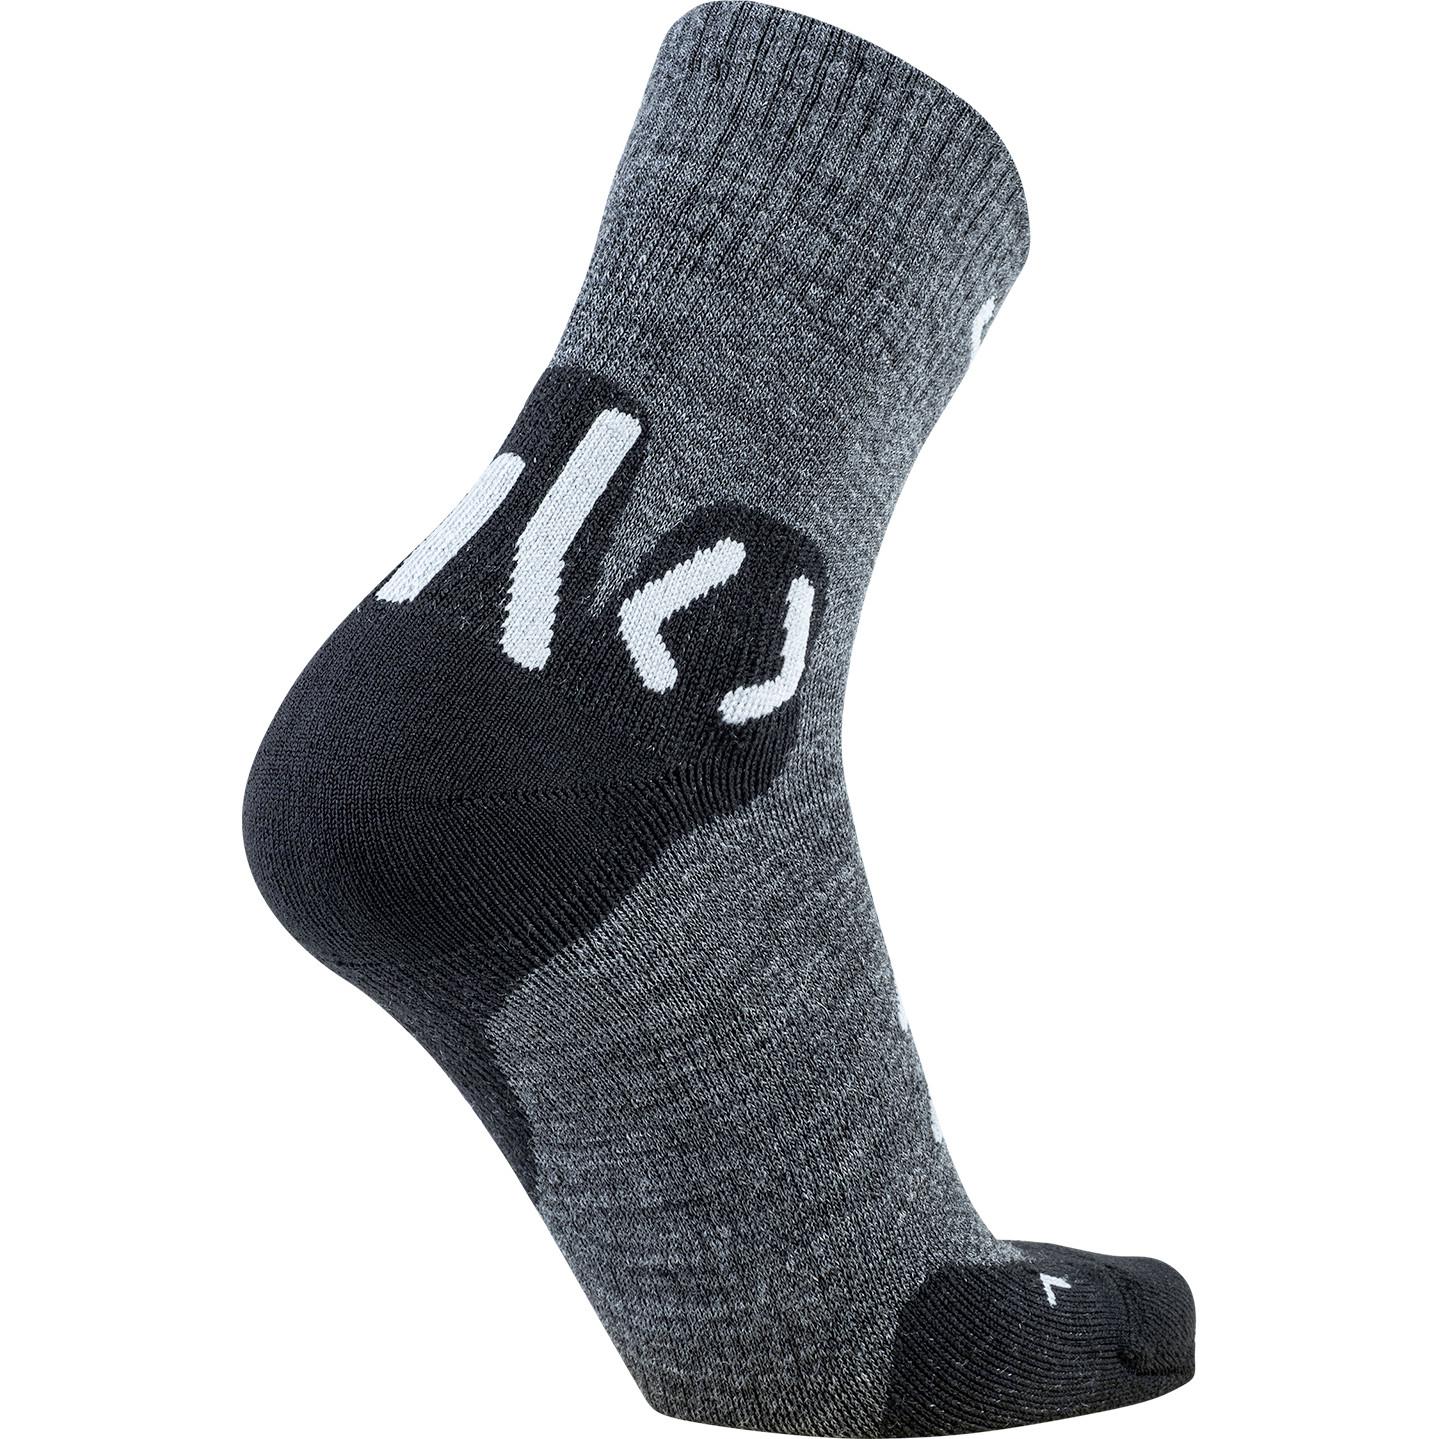 Image of UYN Man Trekking Approach Merino Mid Cut Socks - Anthracite/Black